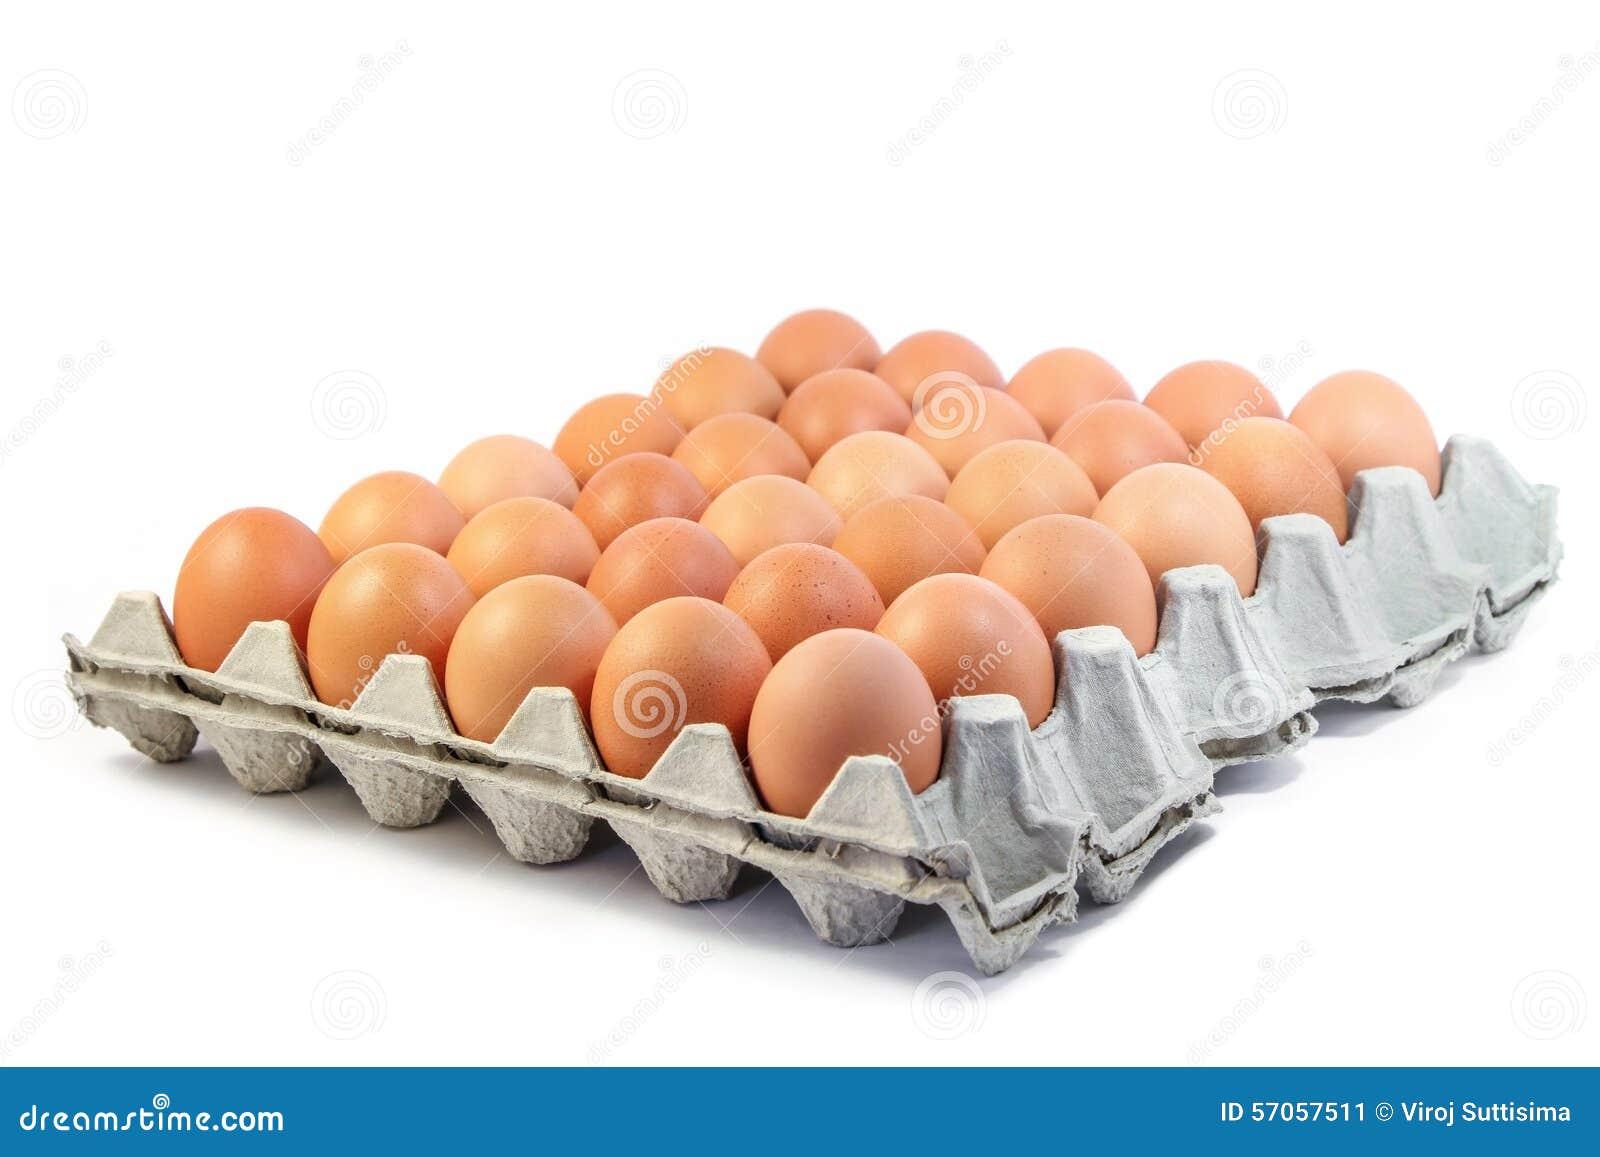 Groep verse eieren in document dienblad op witte achtergrond